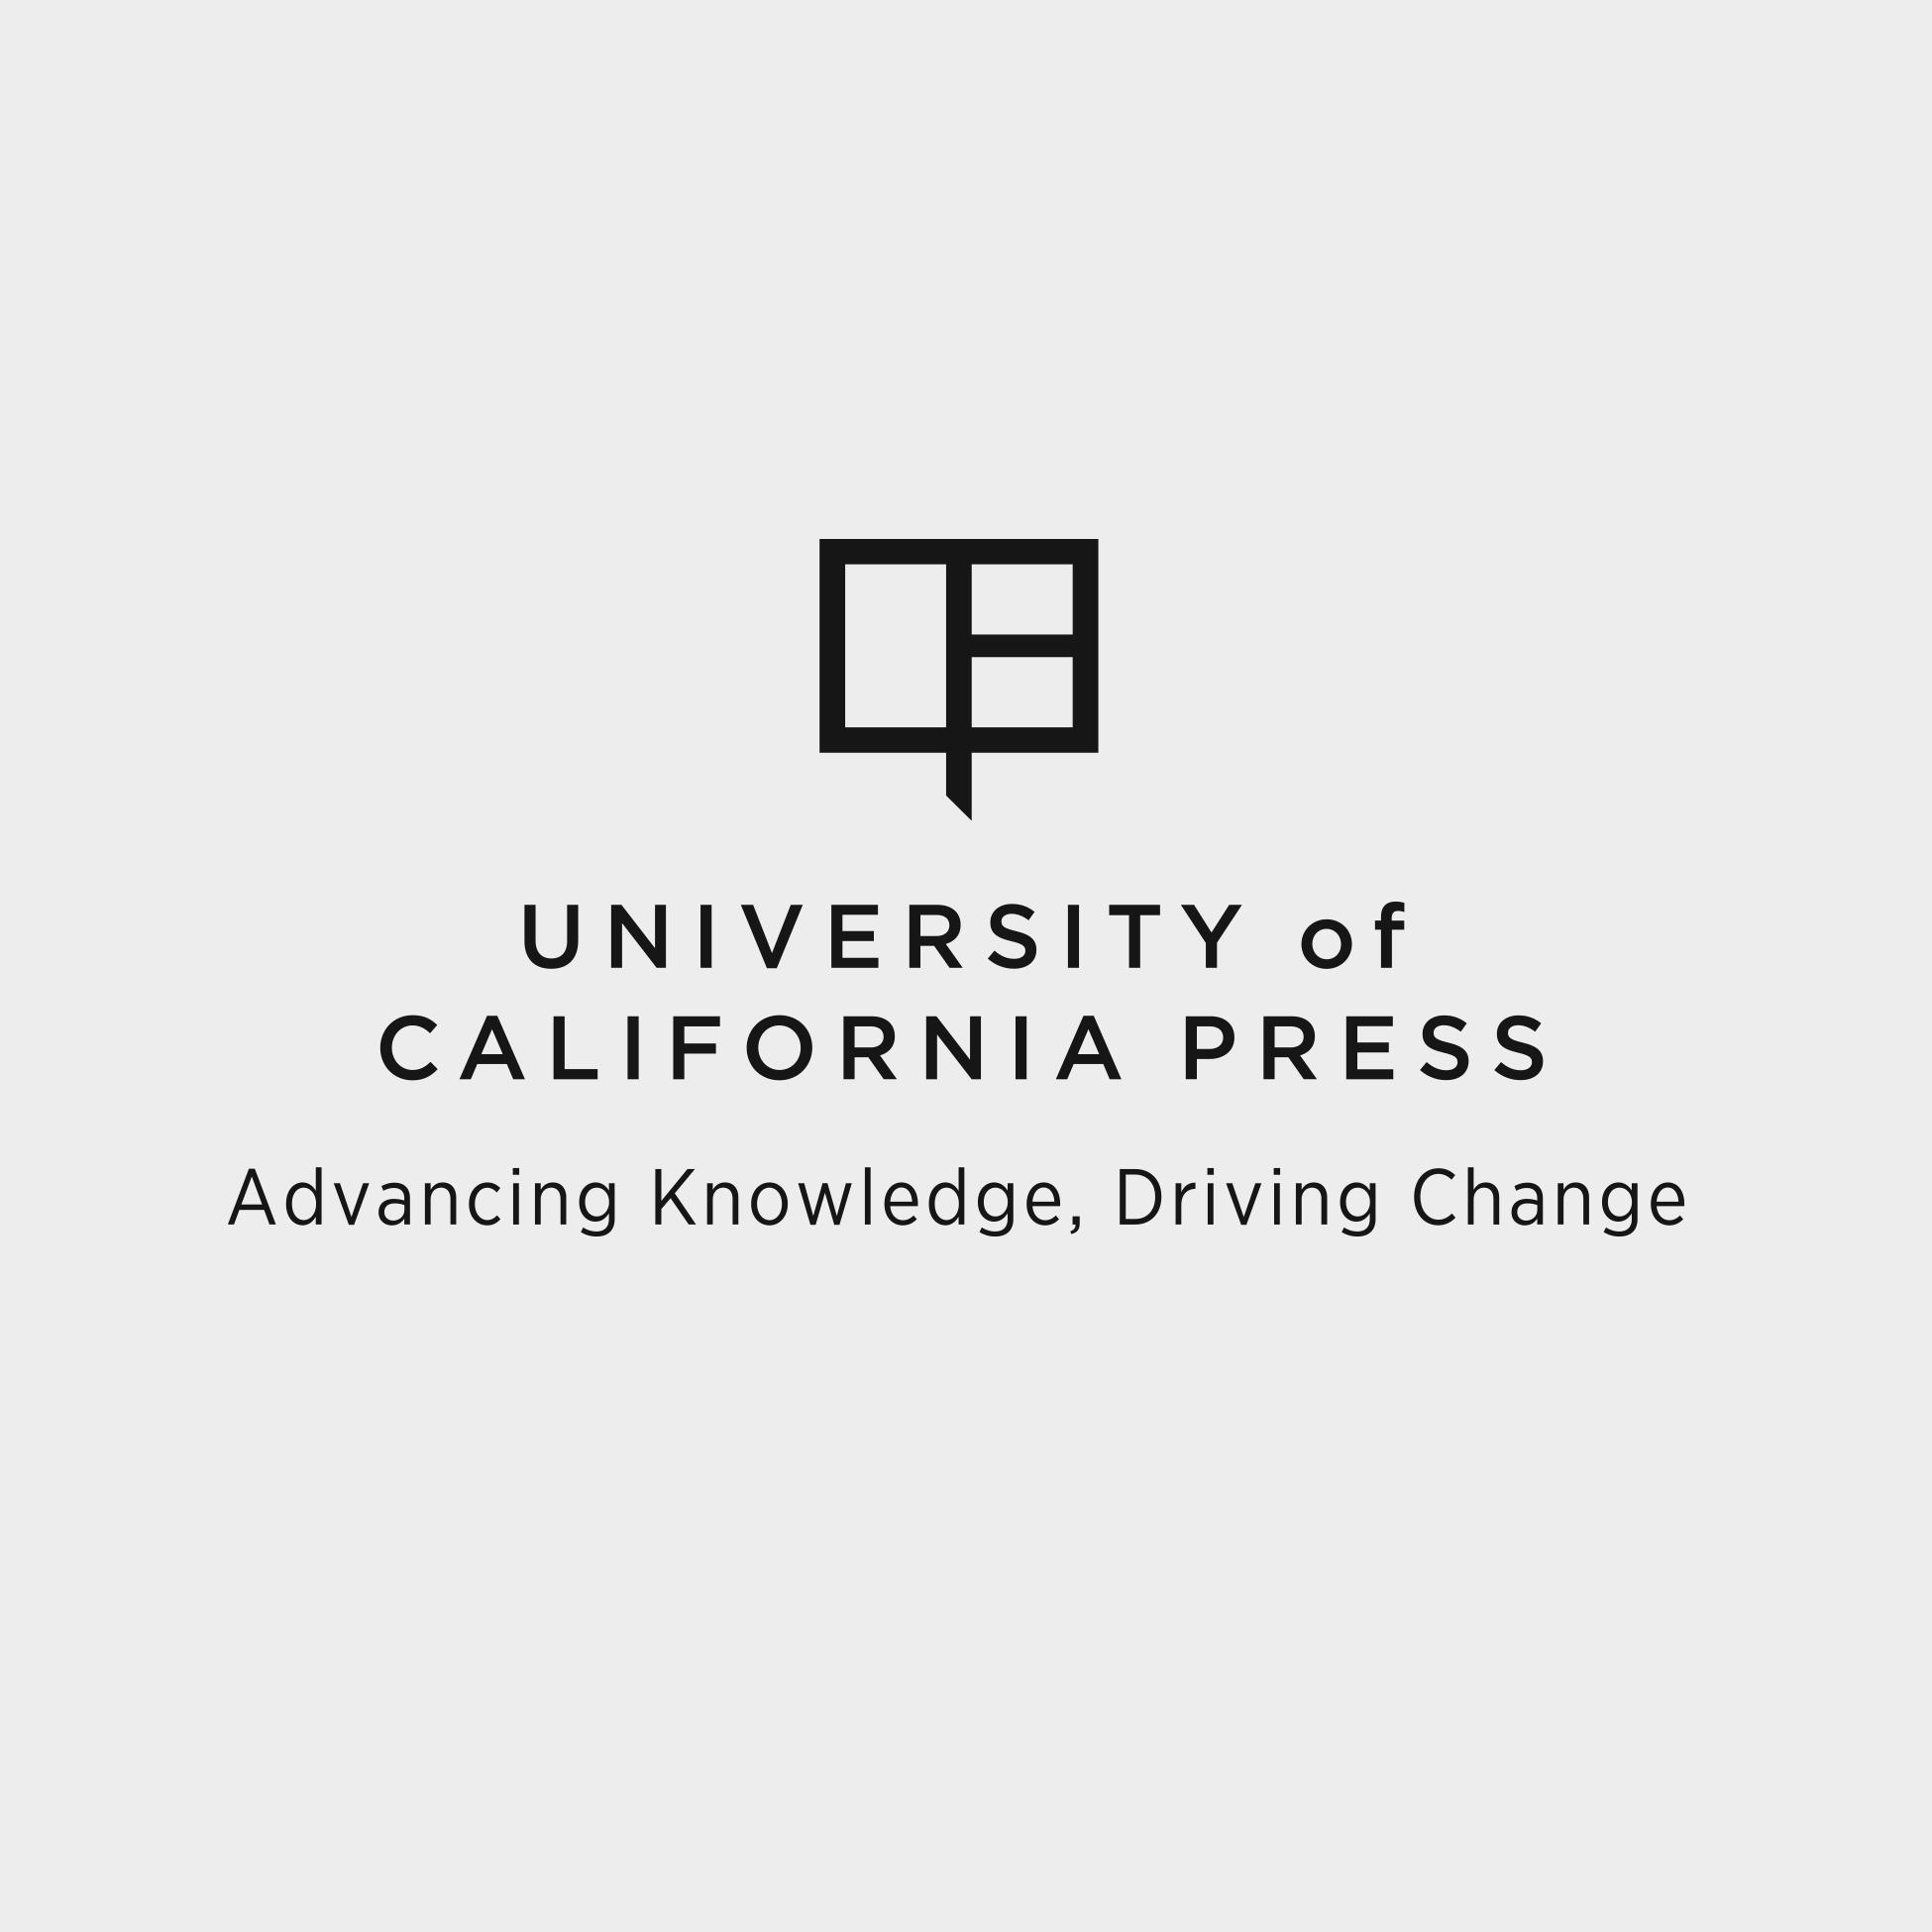 University of California Press, Oakland